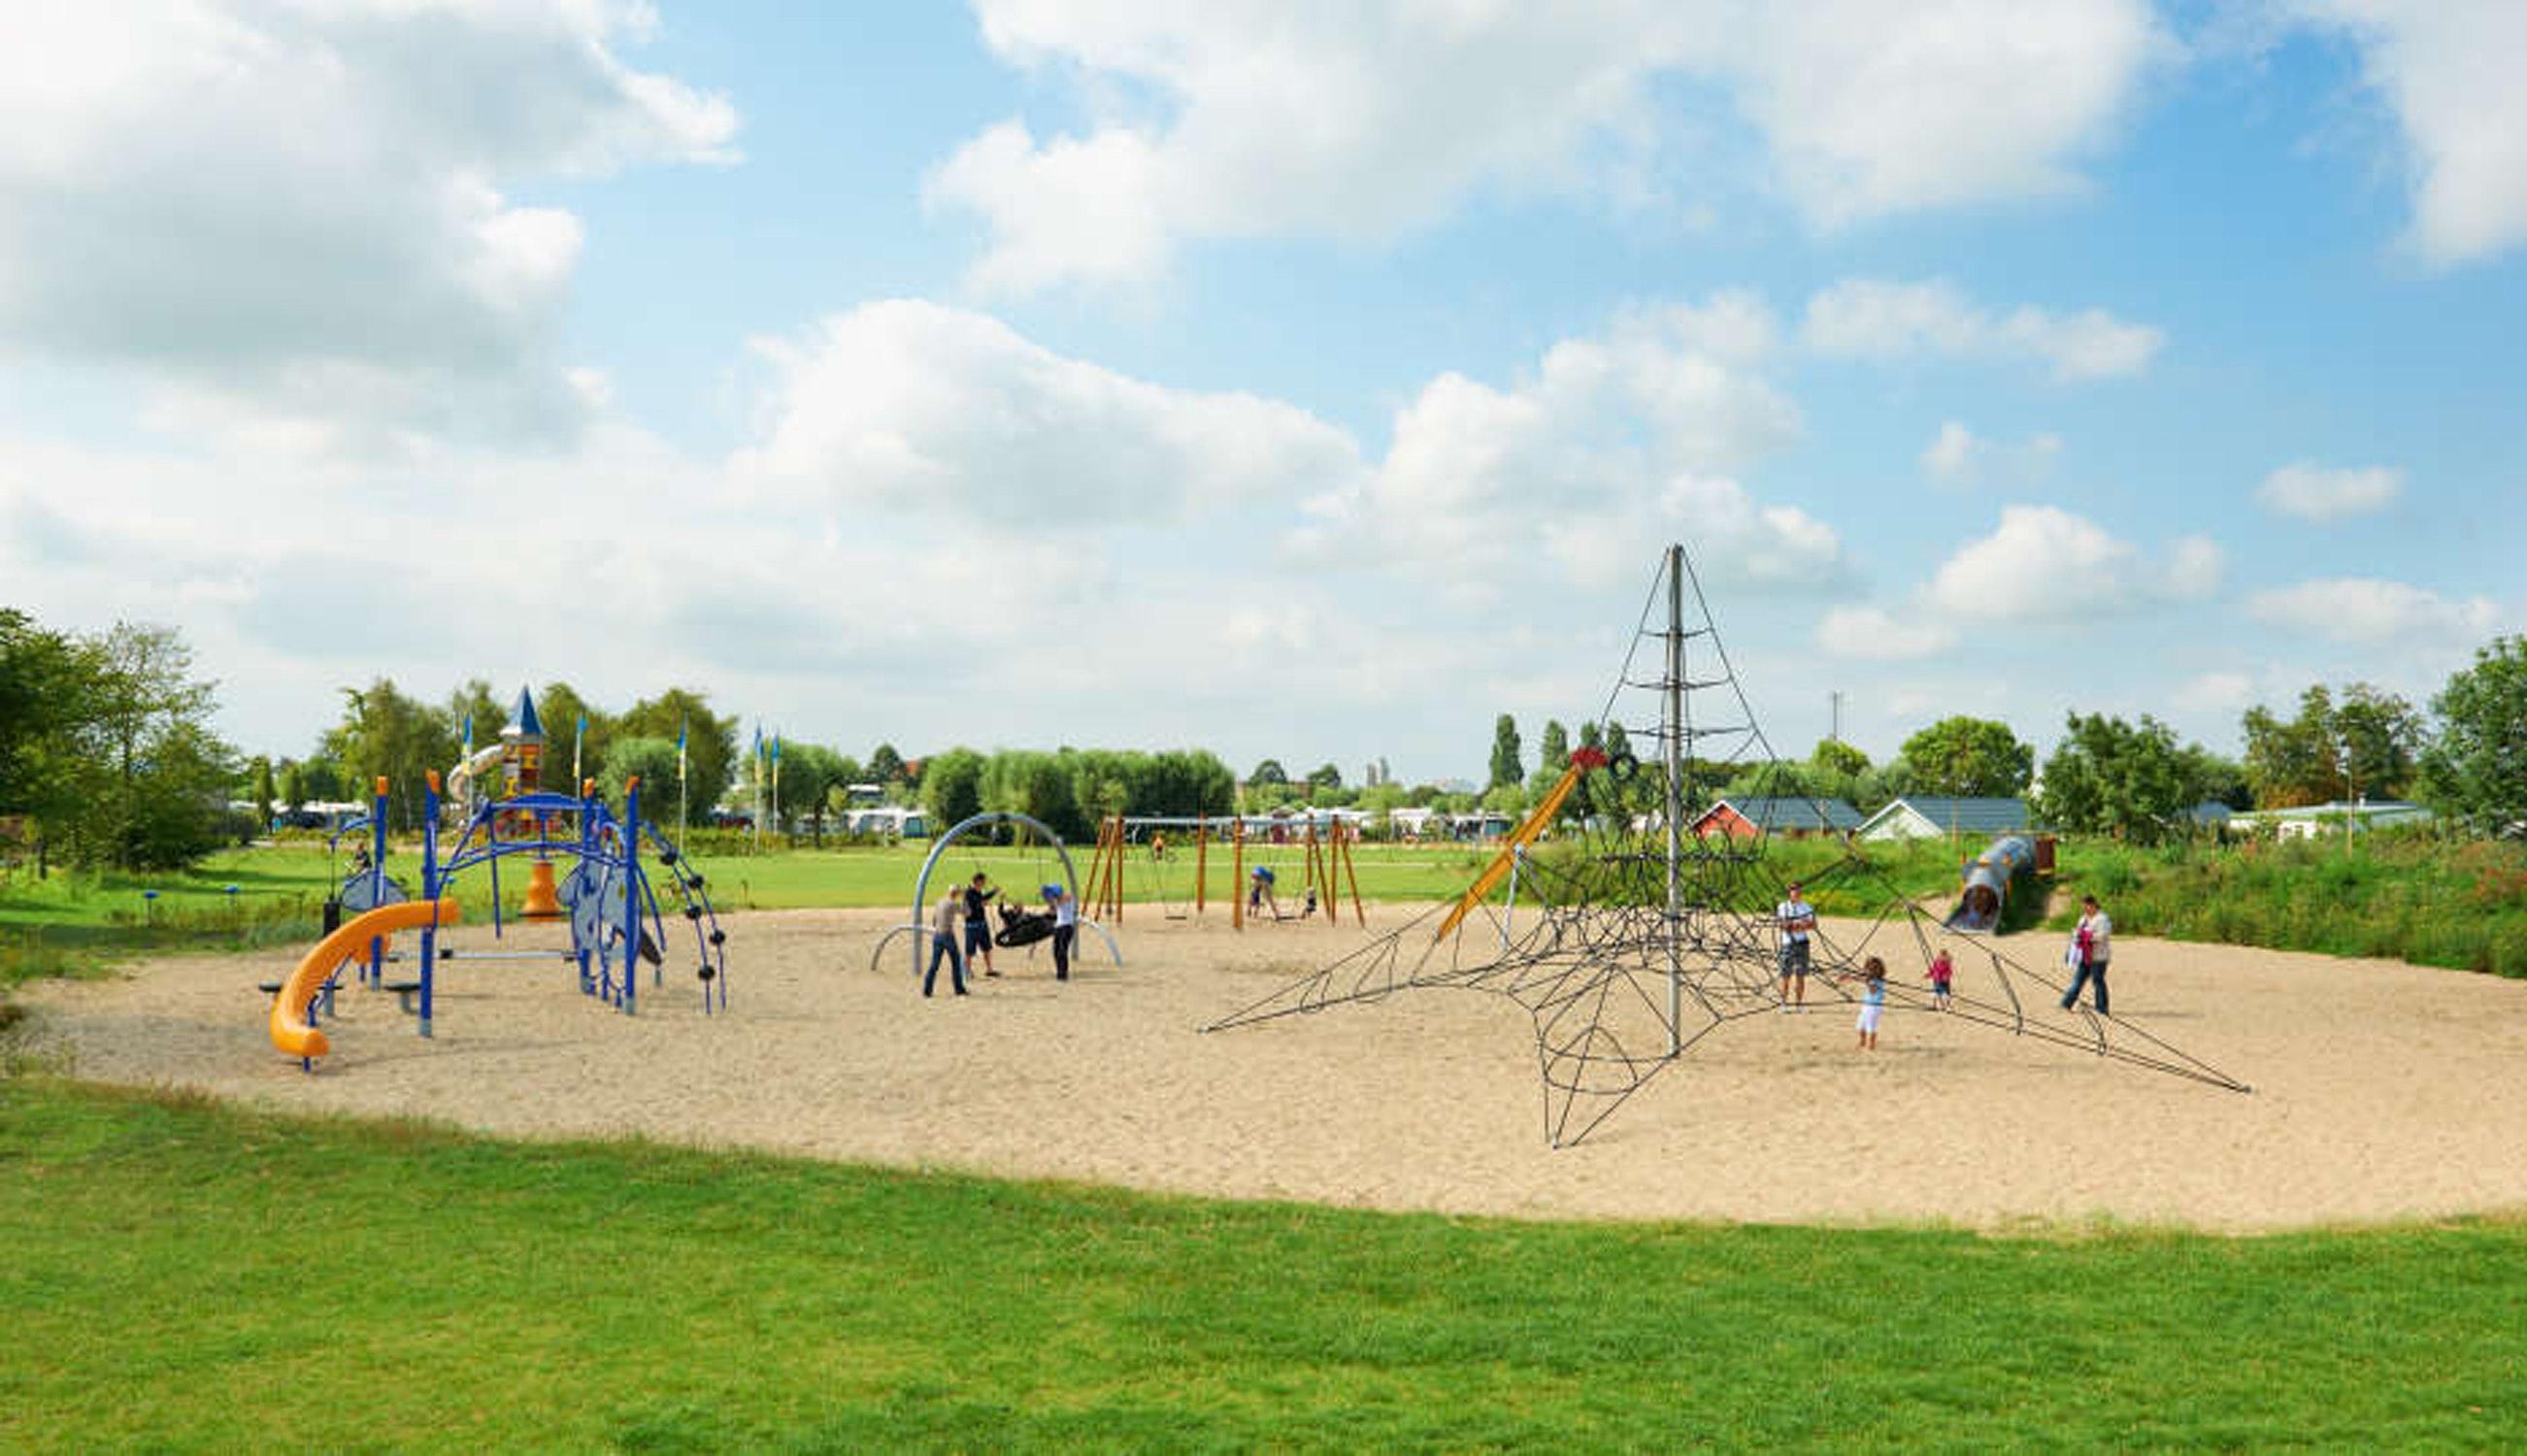 Grote speeltuin Kompas Camping Nieuwpoort